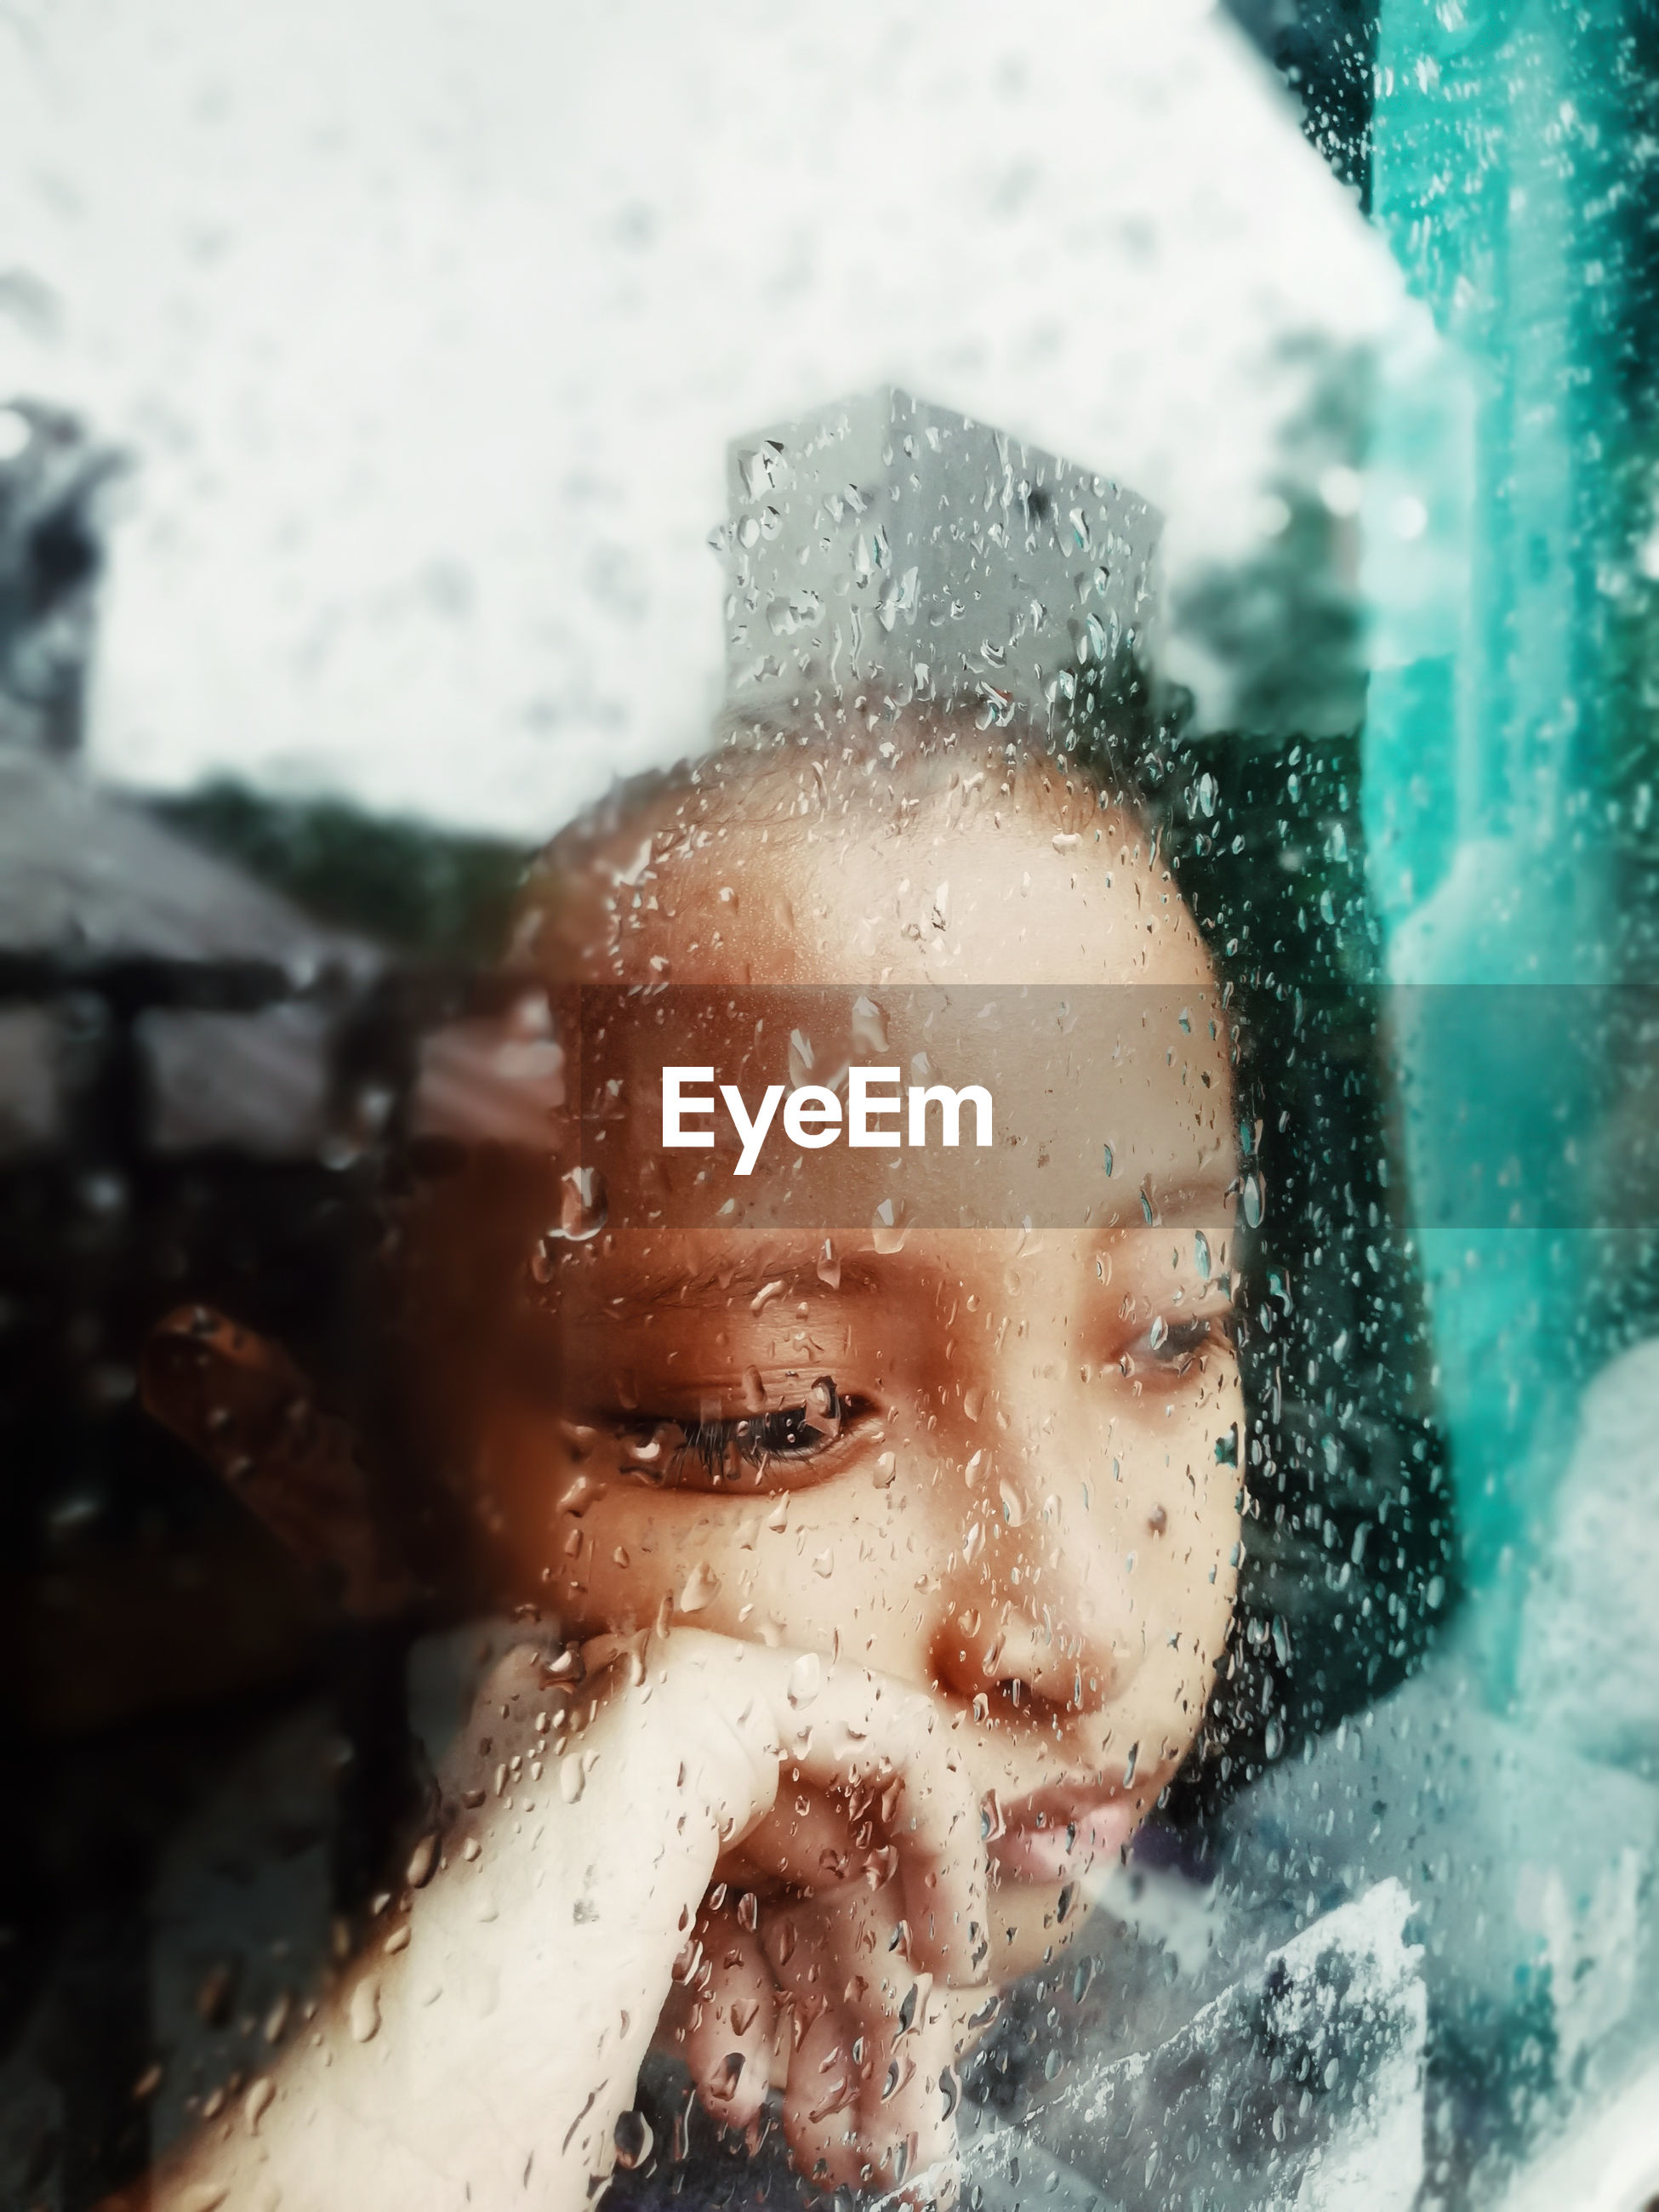 Thoughtful girl seen through wet glass window